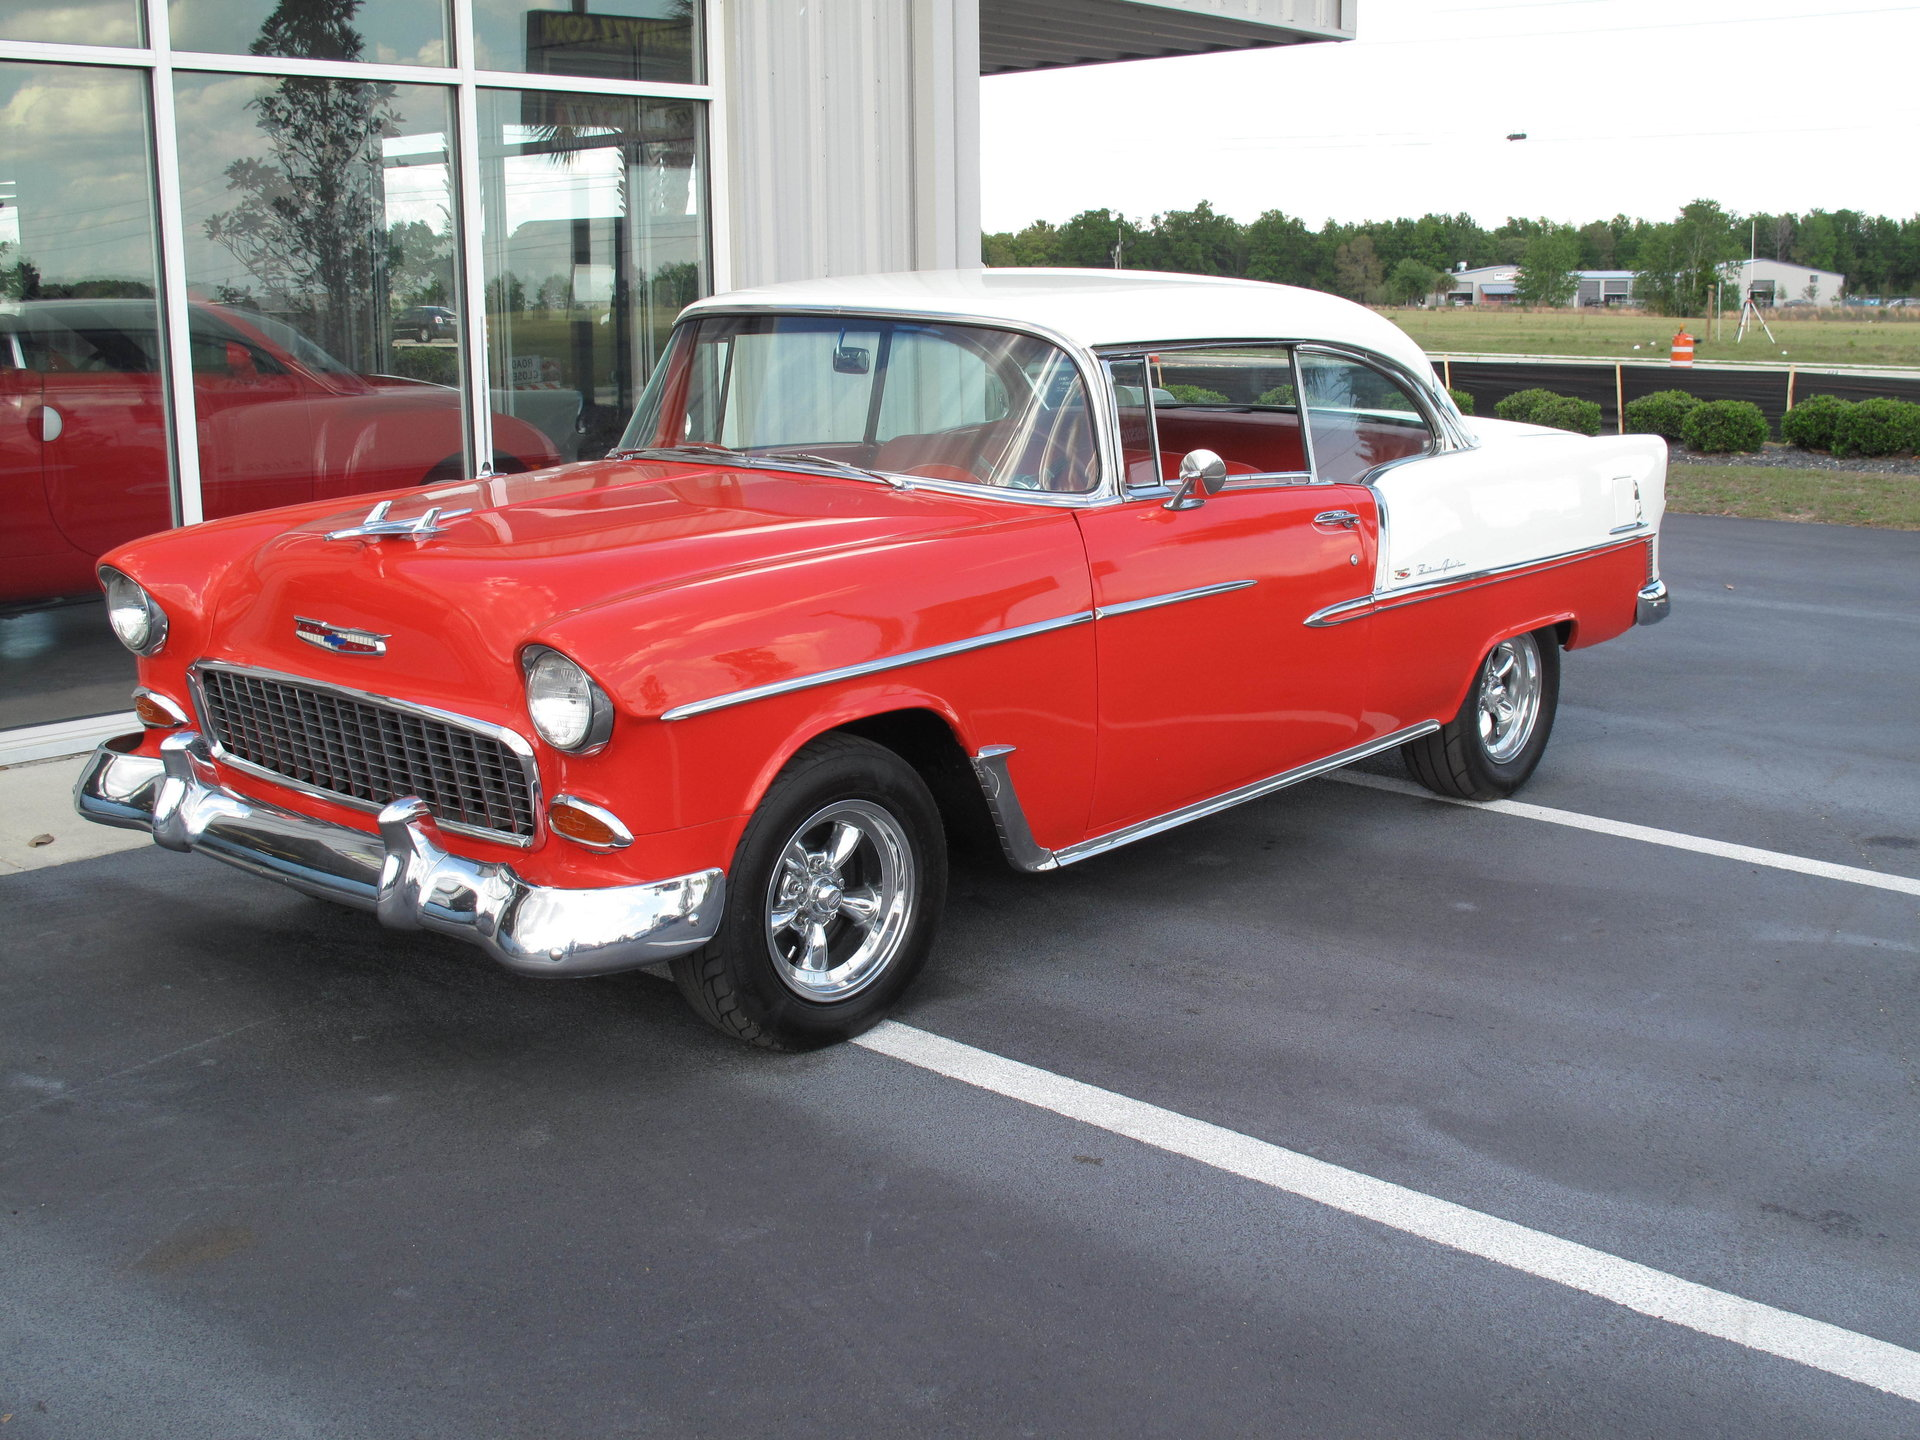 149579f0764e9 hd 1955 chevrolet sedan